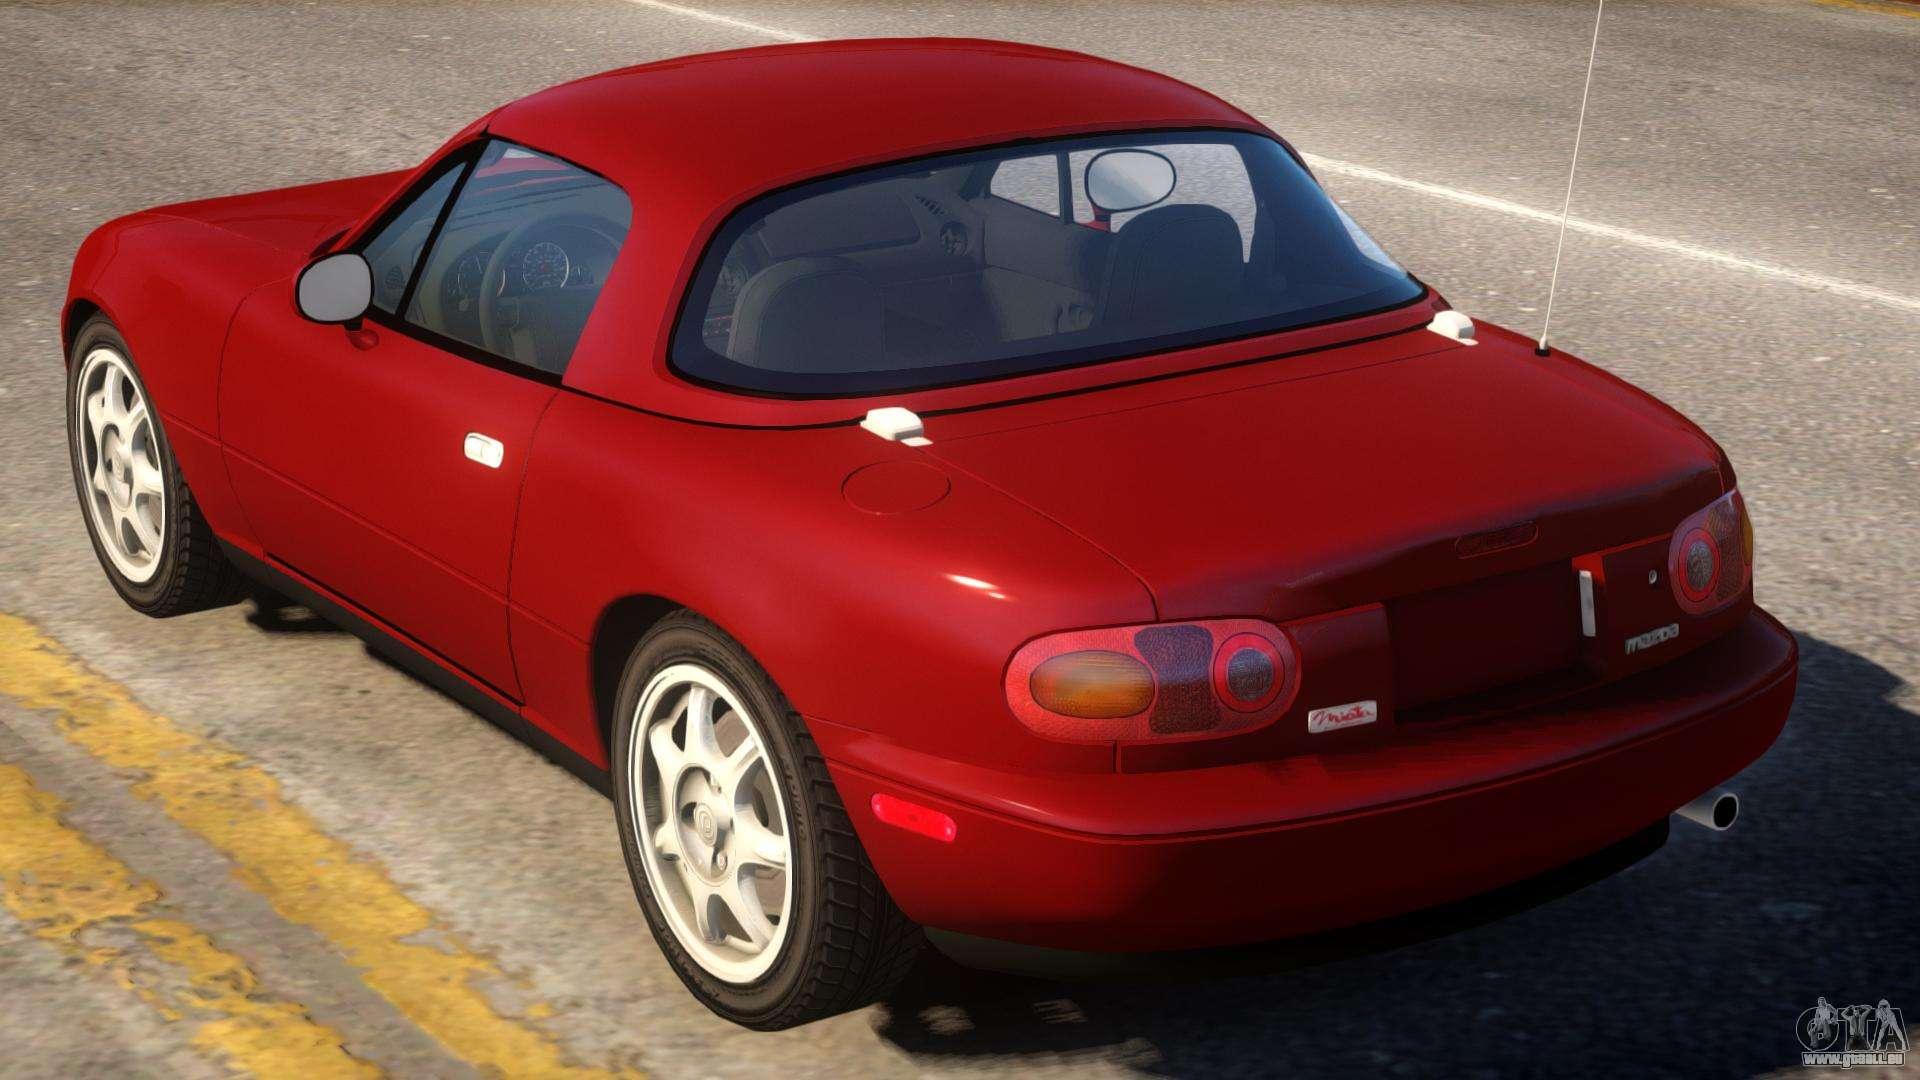 1997 Mazda Miata MX-5 pour GTA 4